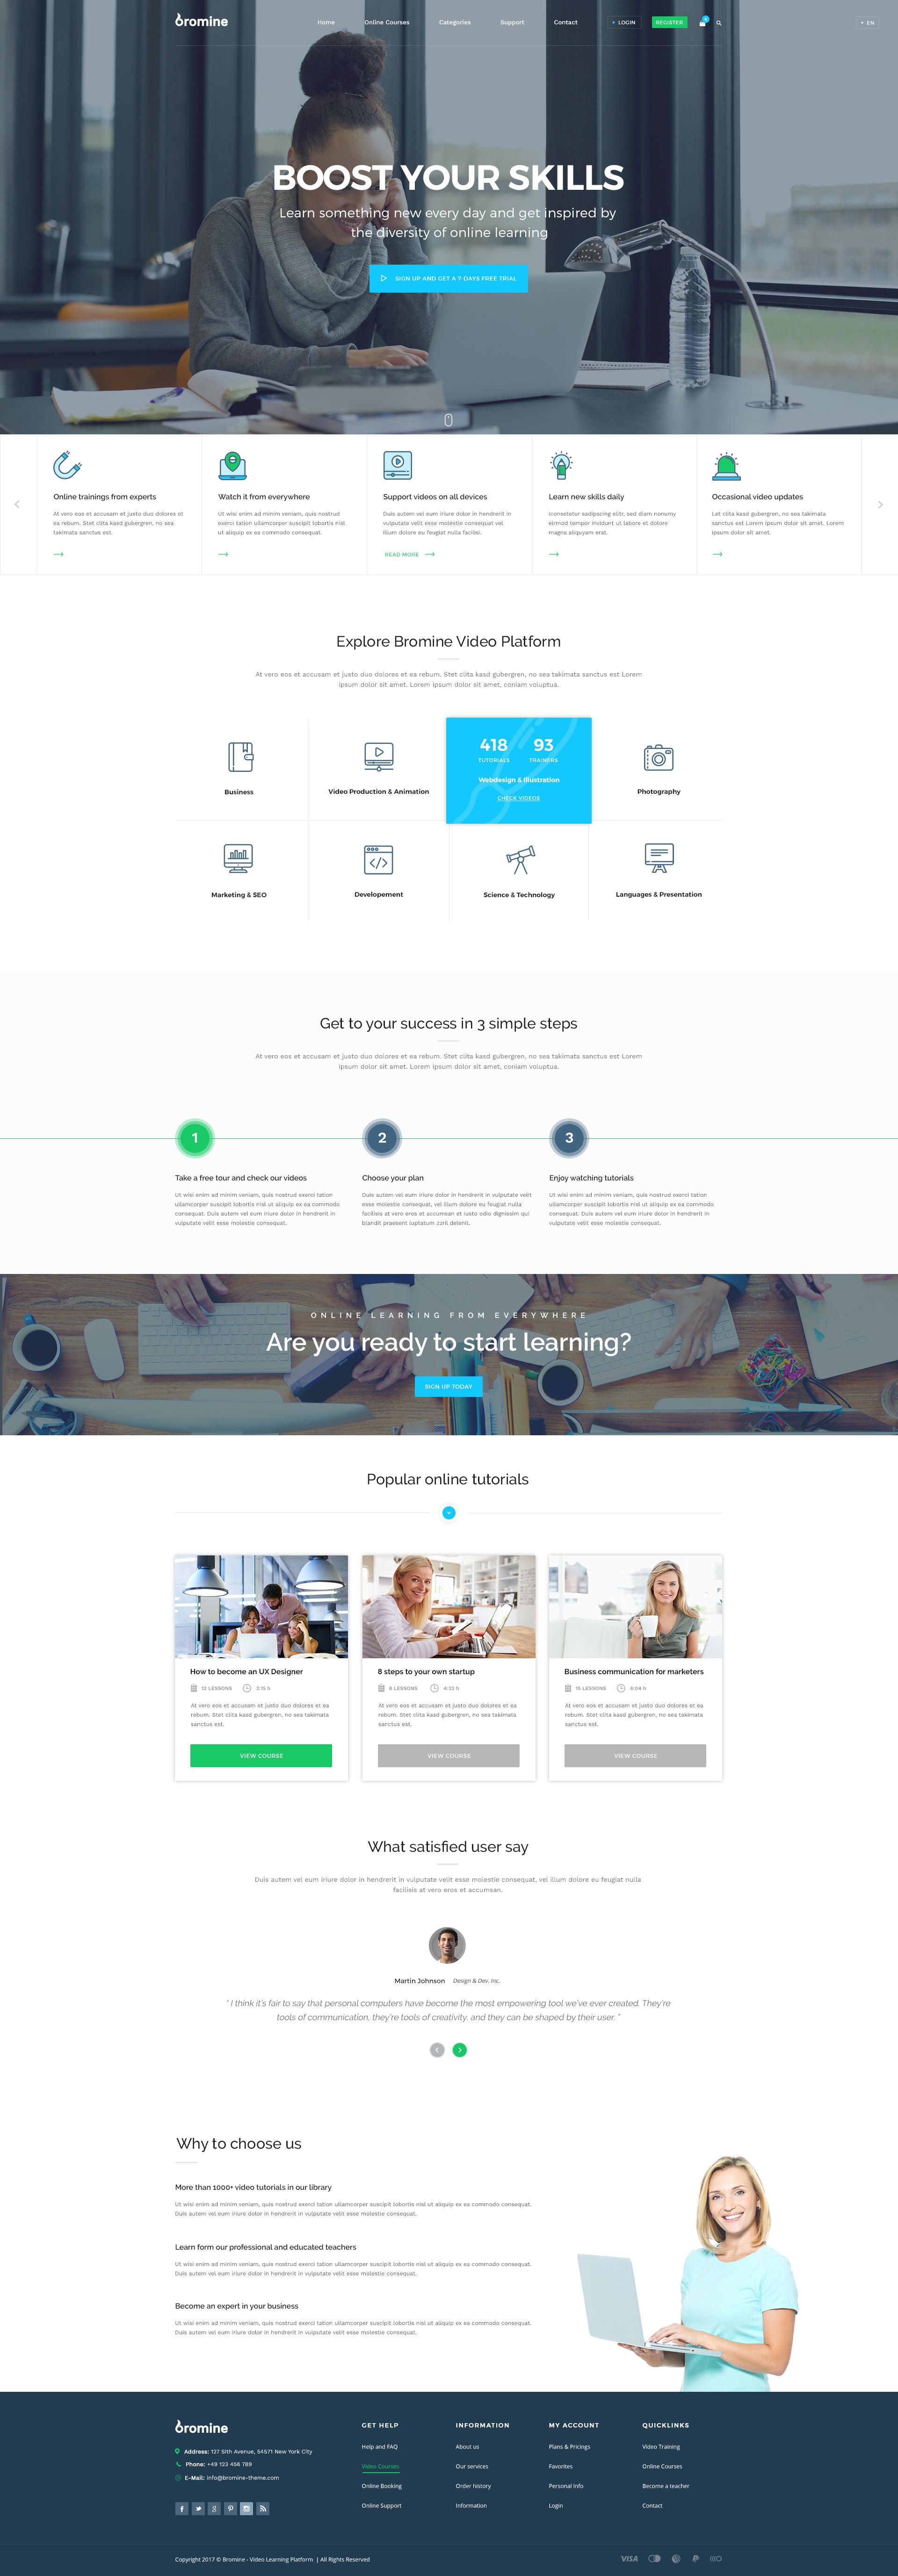 Bromine - Online Learning Platform template by KL-Webmedia